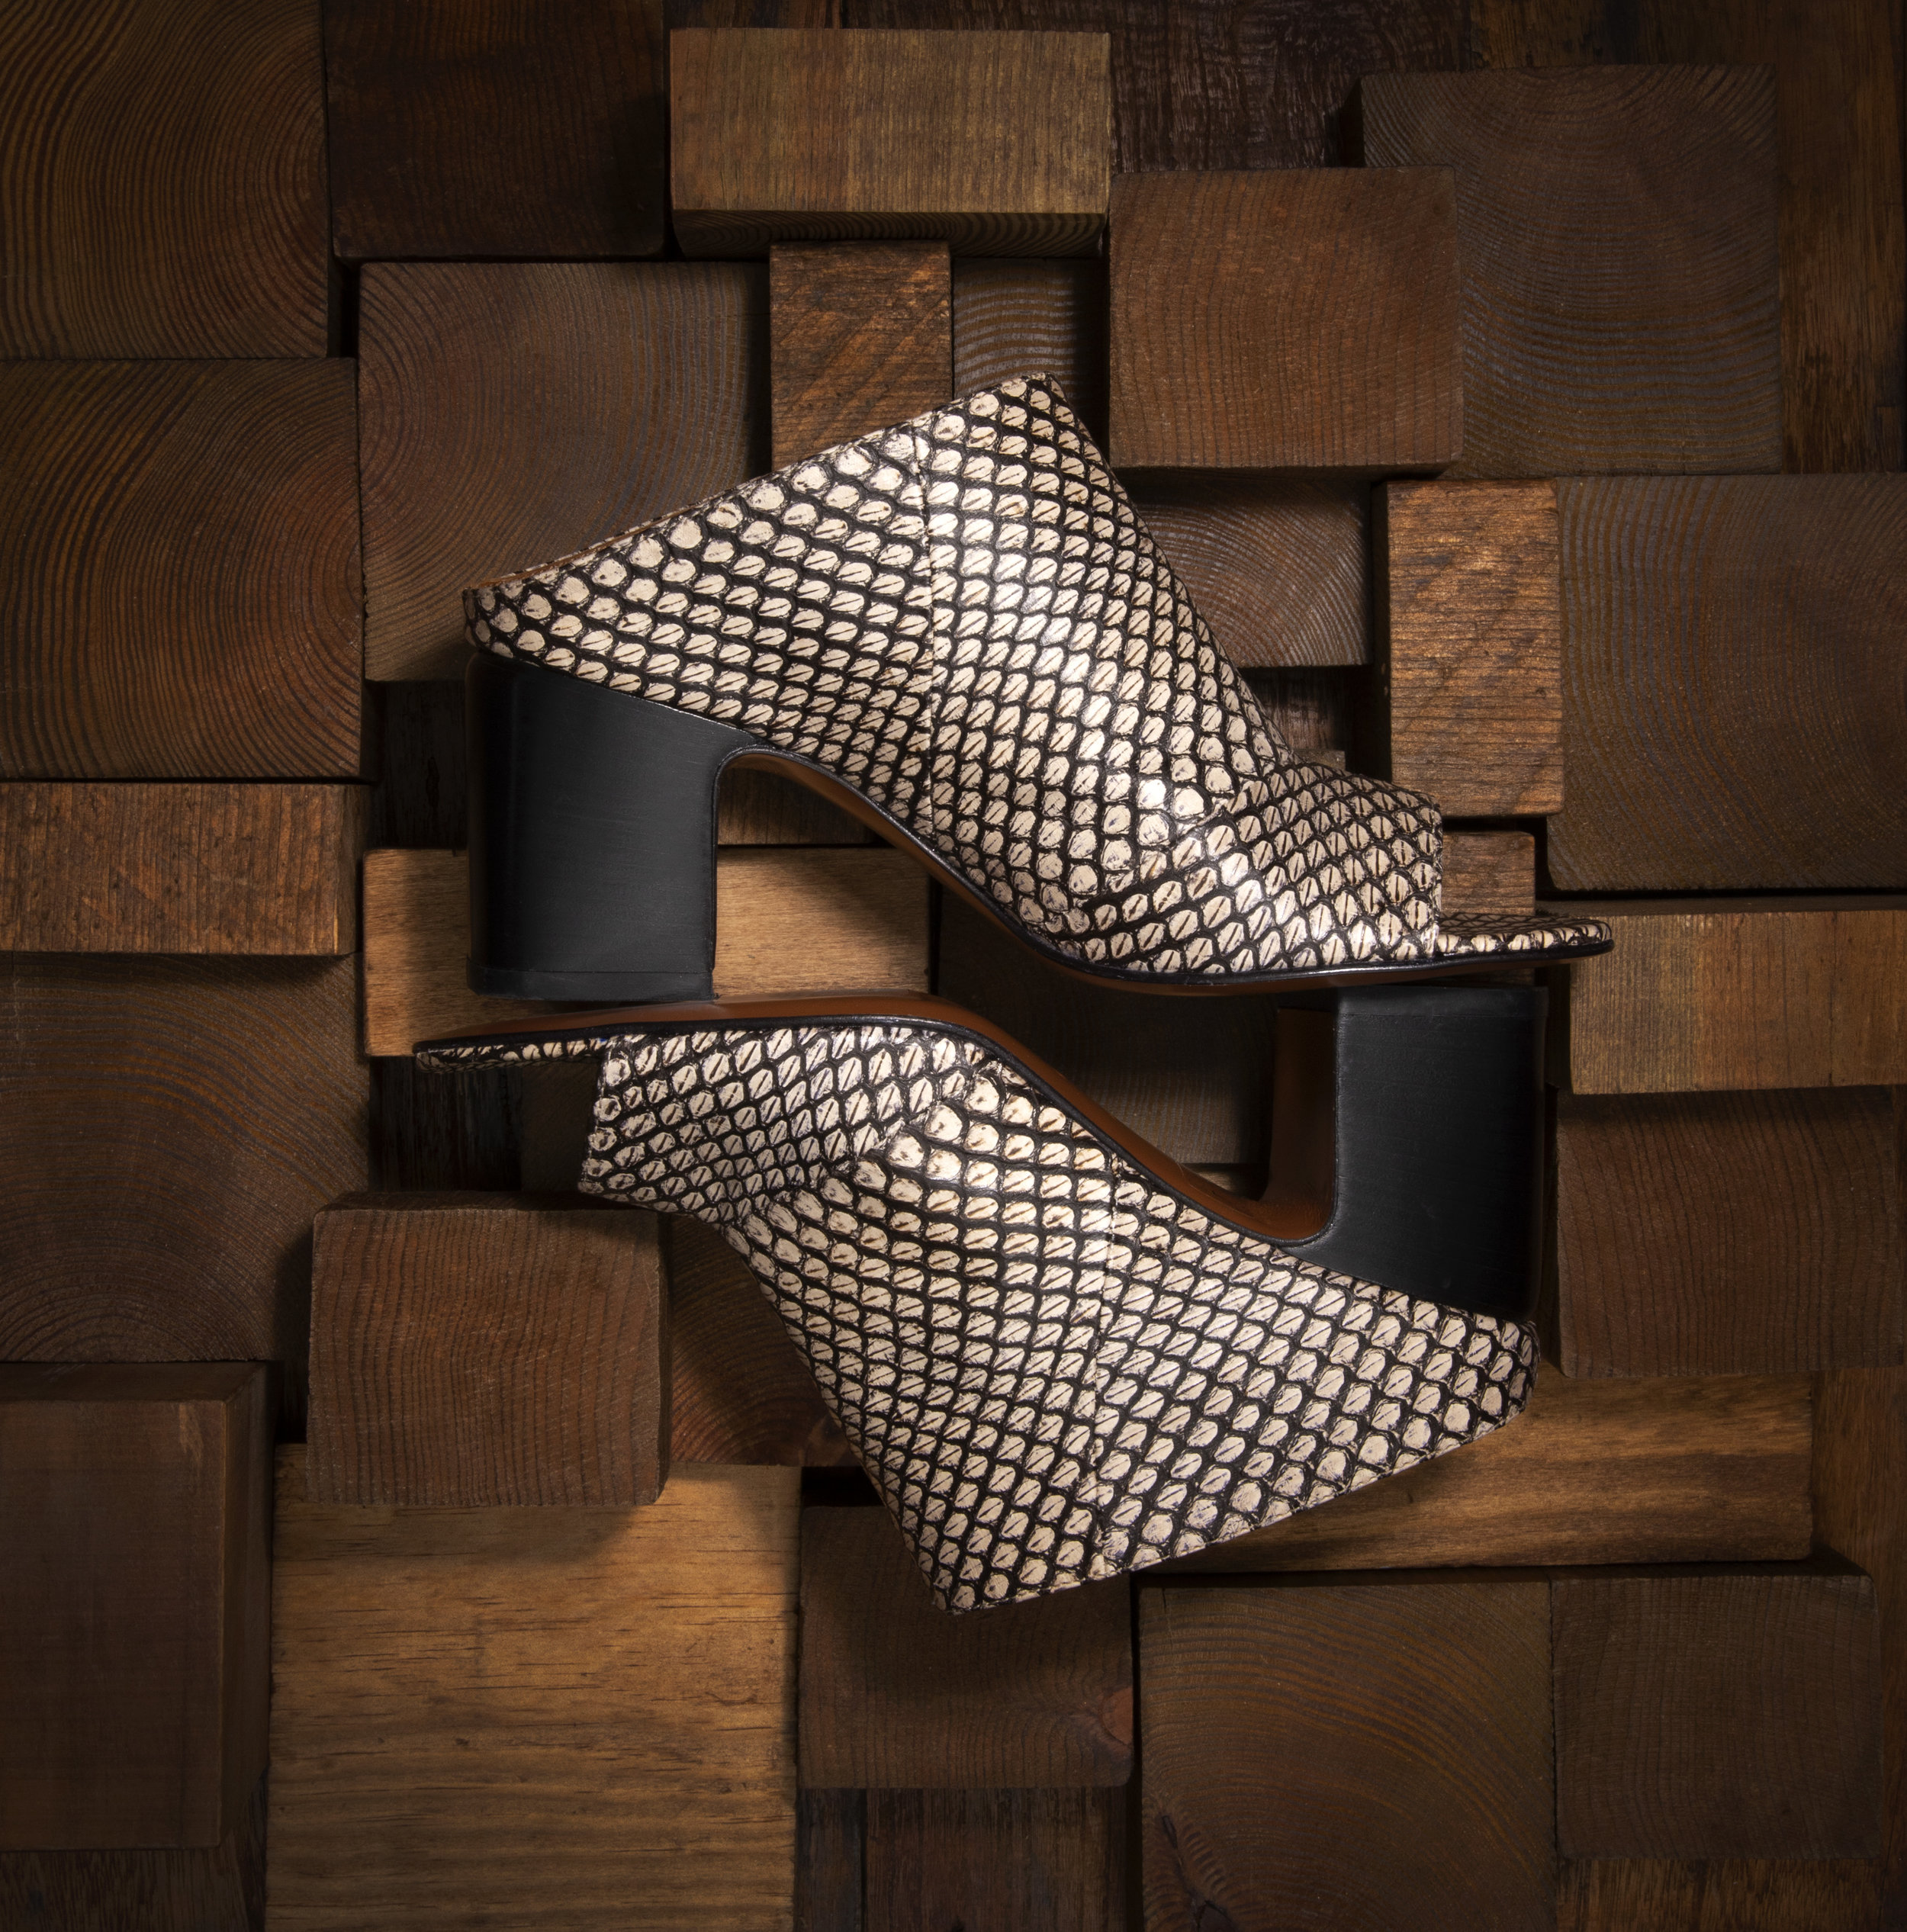 shoes_still_life